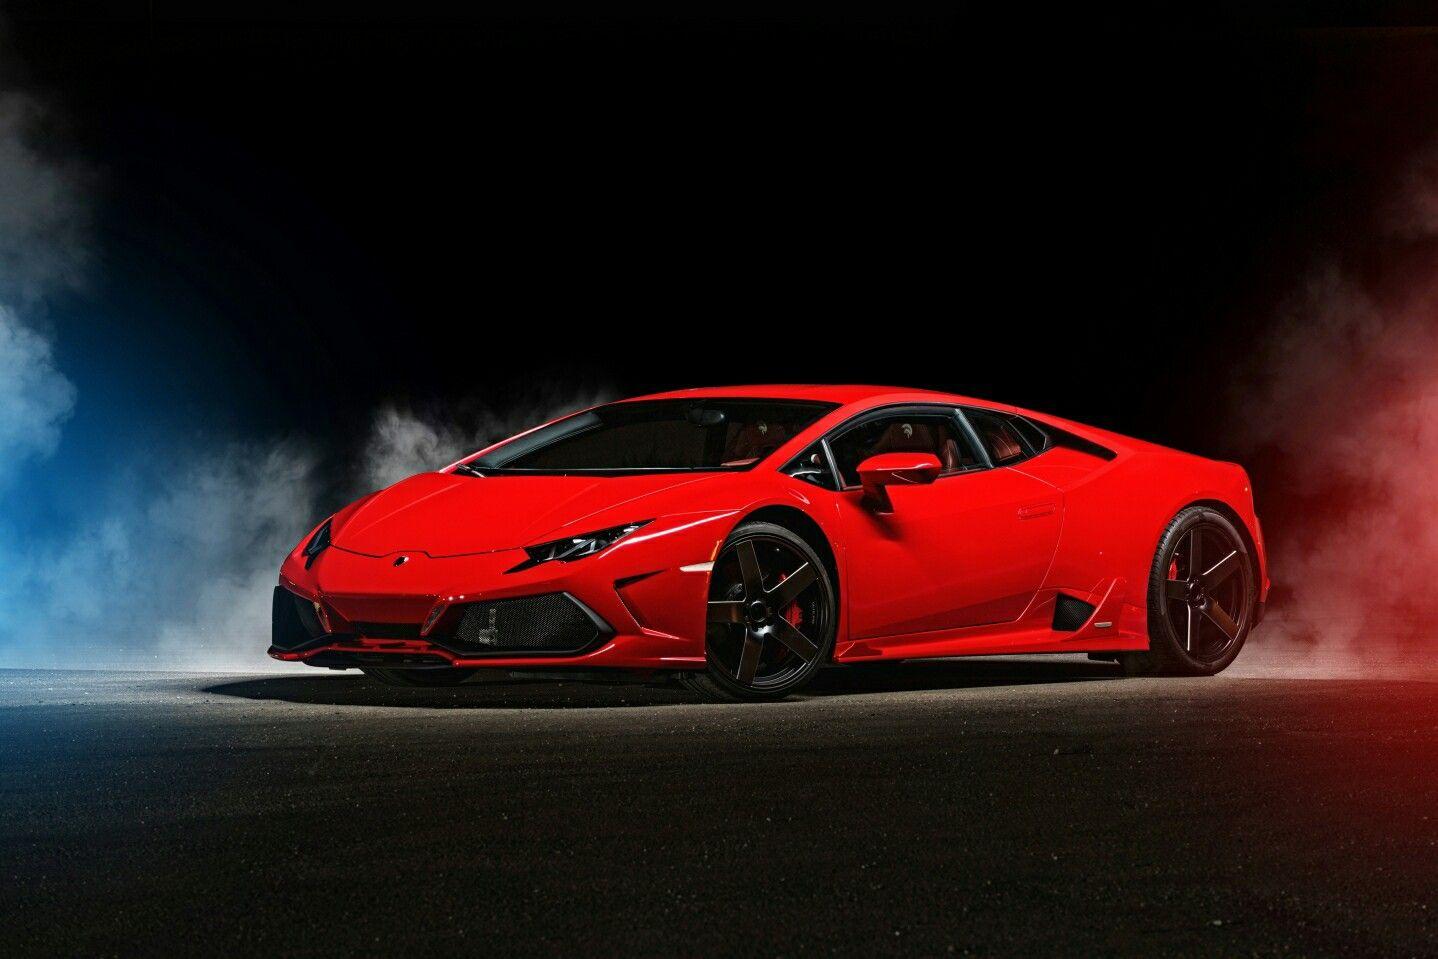 Image From Http://fullhdpictures.com/wp Content/uploads/2015/04/Great  Lamborghini Hurac%C3%A1n Wallpapers.   Lamborghini Veneno   Pinterest  ...